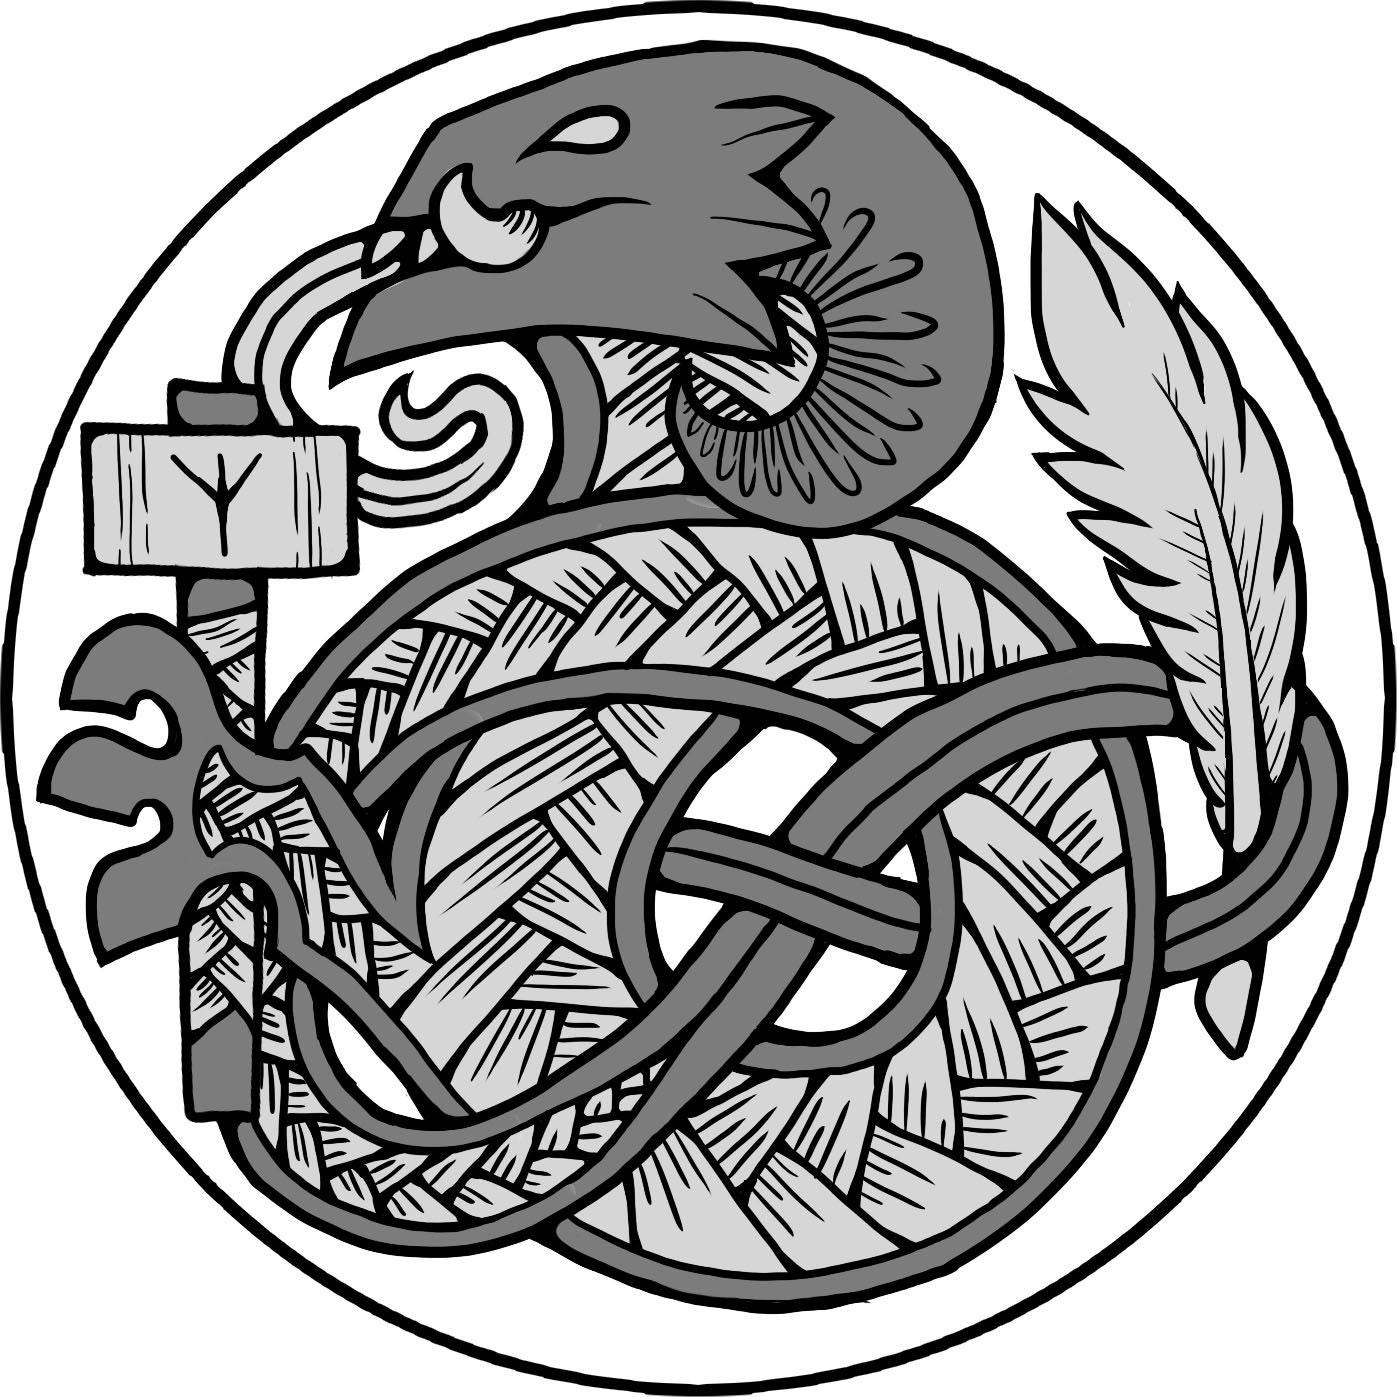 Runic Leather Snap Bracelet Viking Runescript Sayings Names Etsy